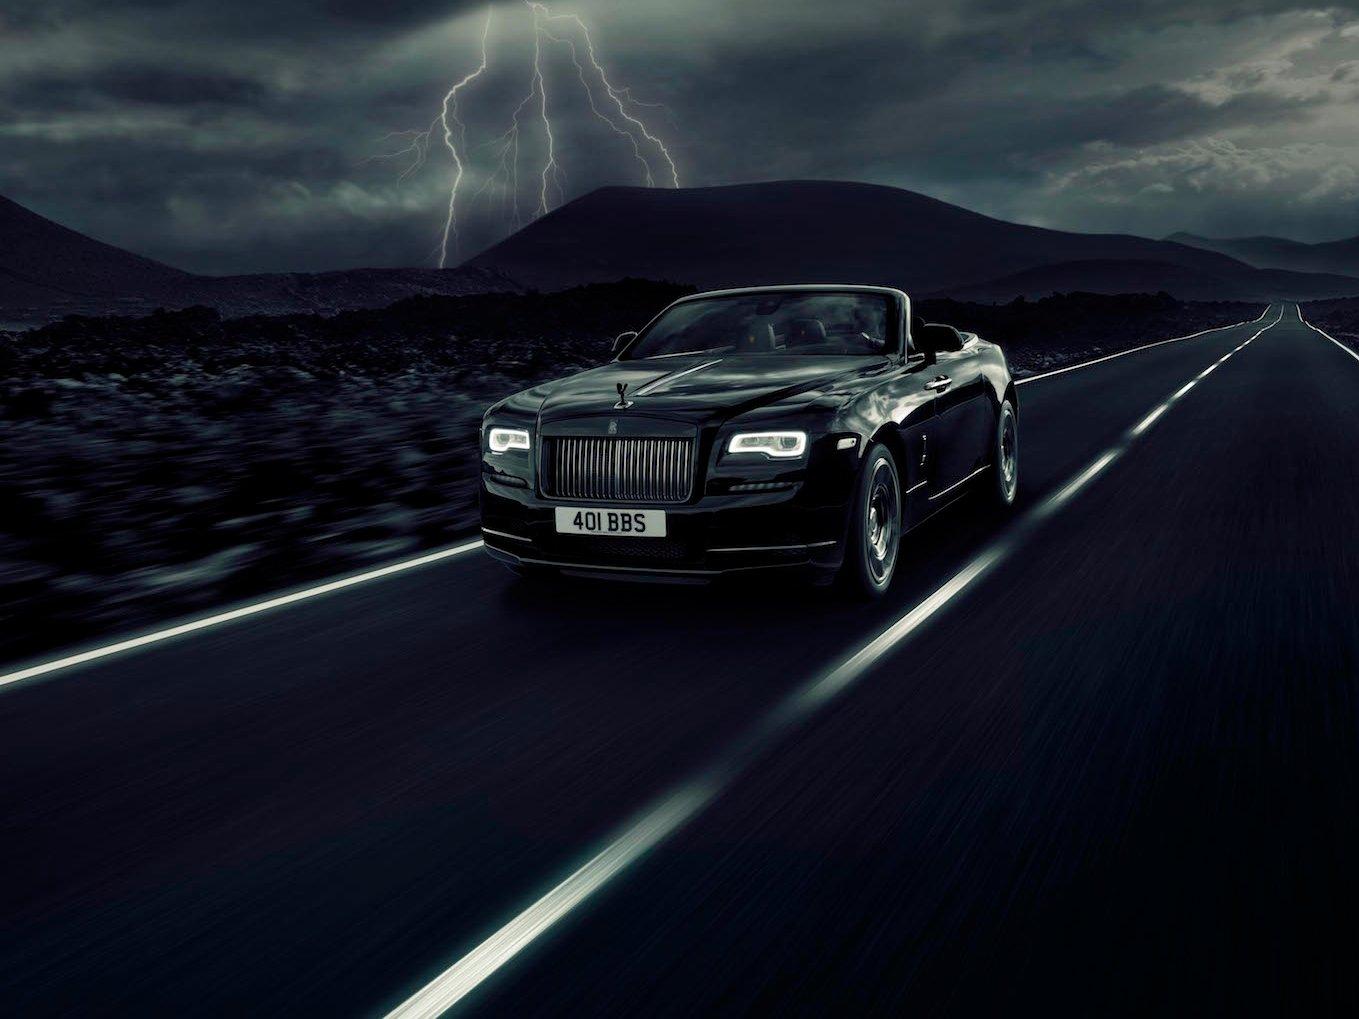 Xe Rolls-Royce Dawn Black Badge